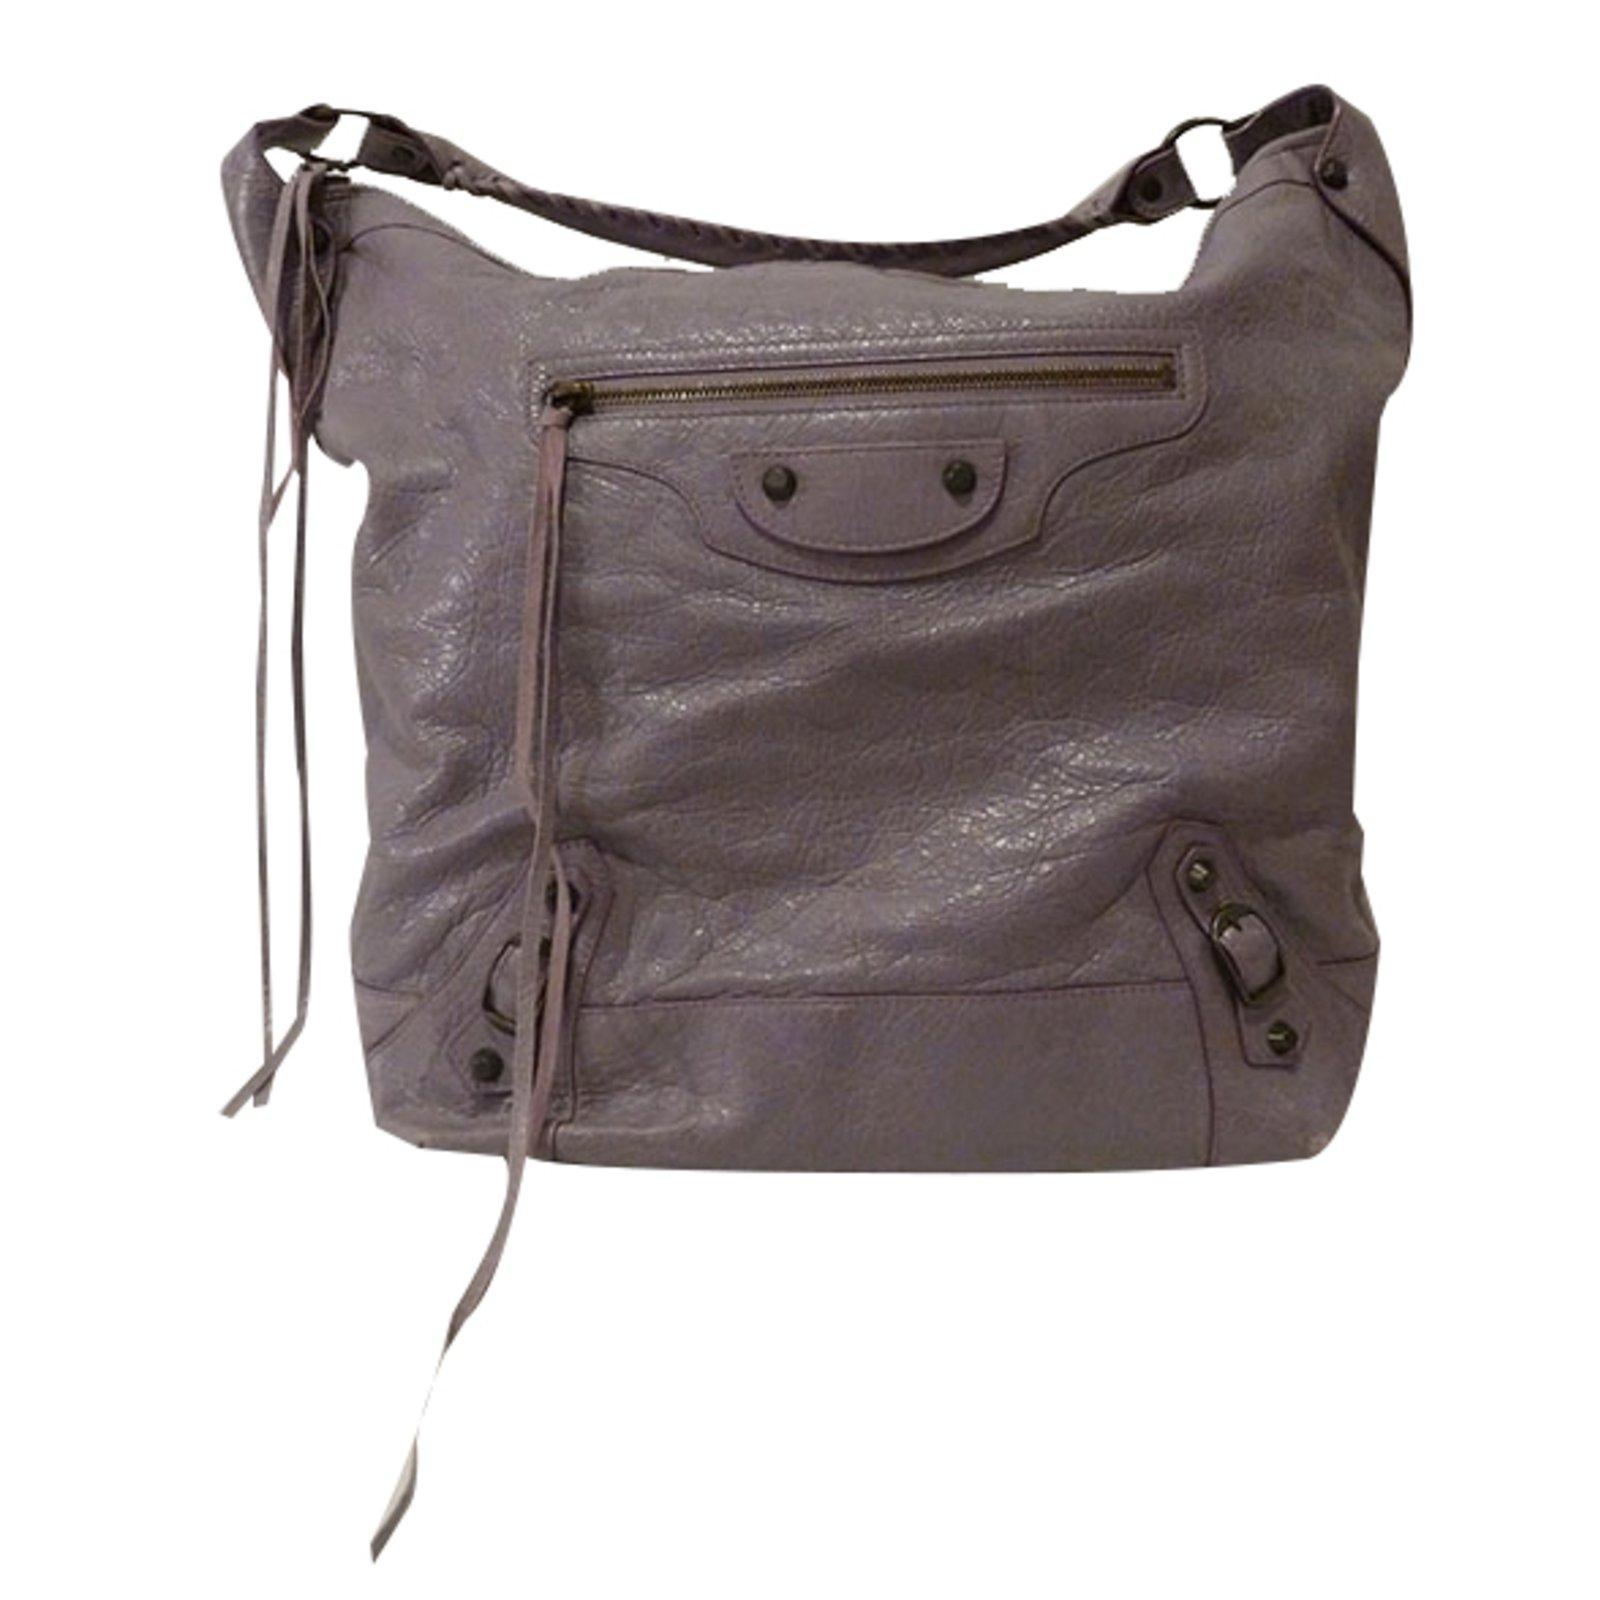 9811d5675bcd Balenciaga Classic Day Hobo Bag Handbags Leather Purple ref.21686 ...